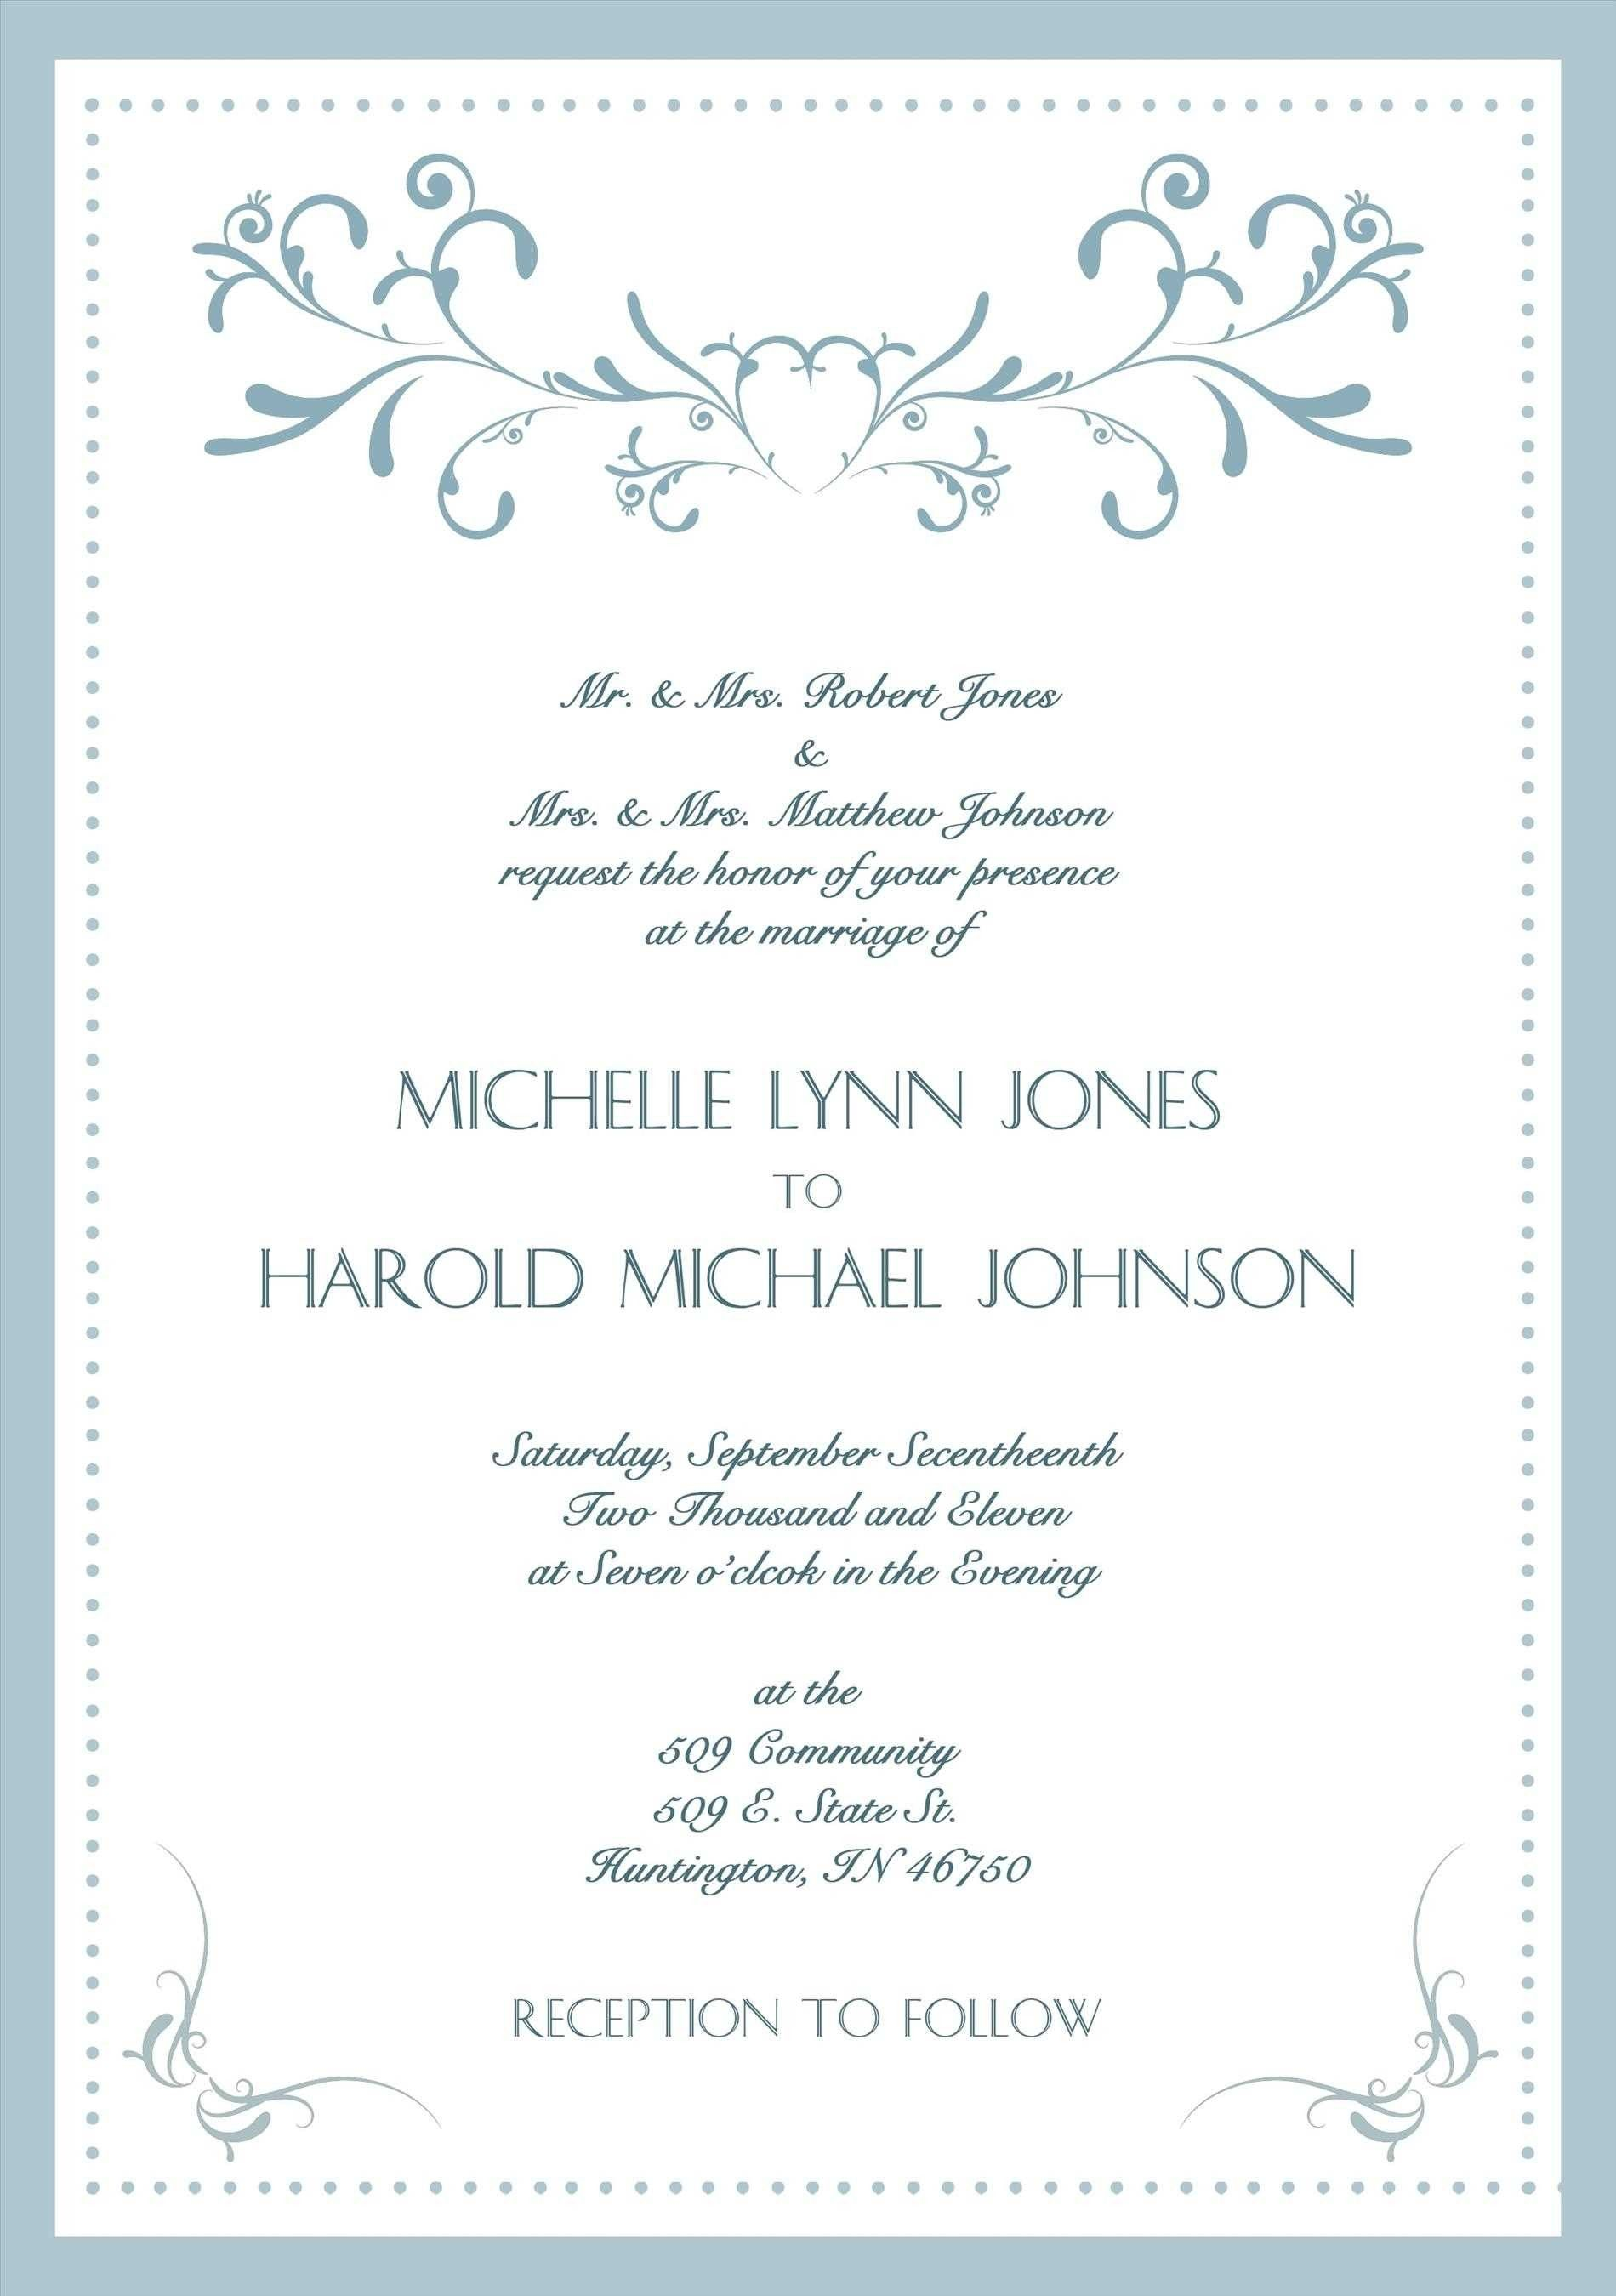 Lovely formal Wedding Invitation Wording Sample wedding